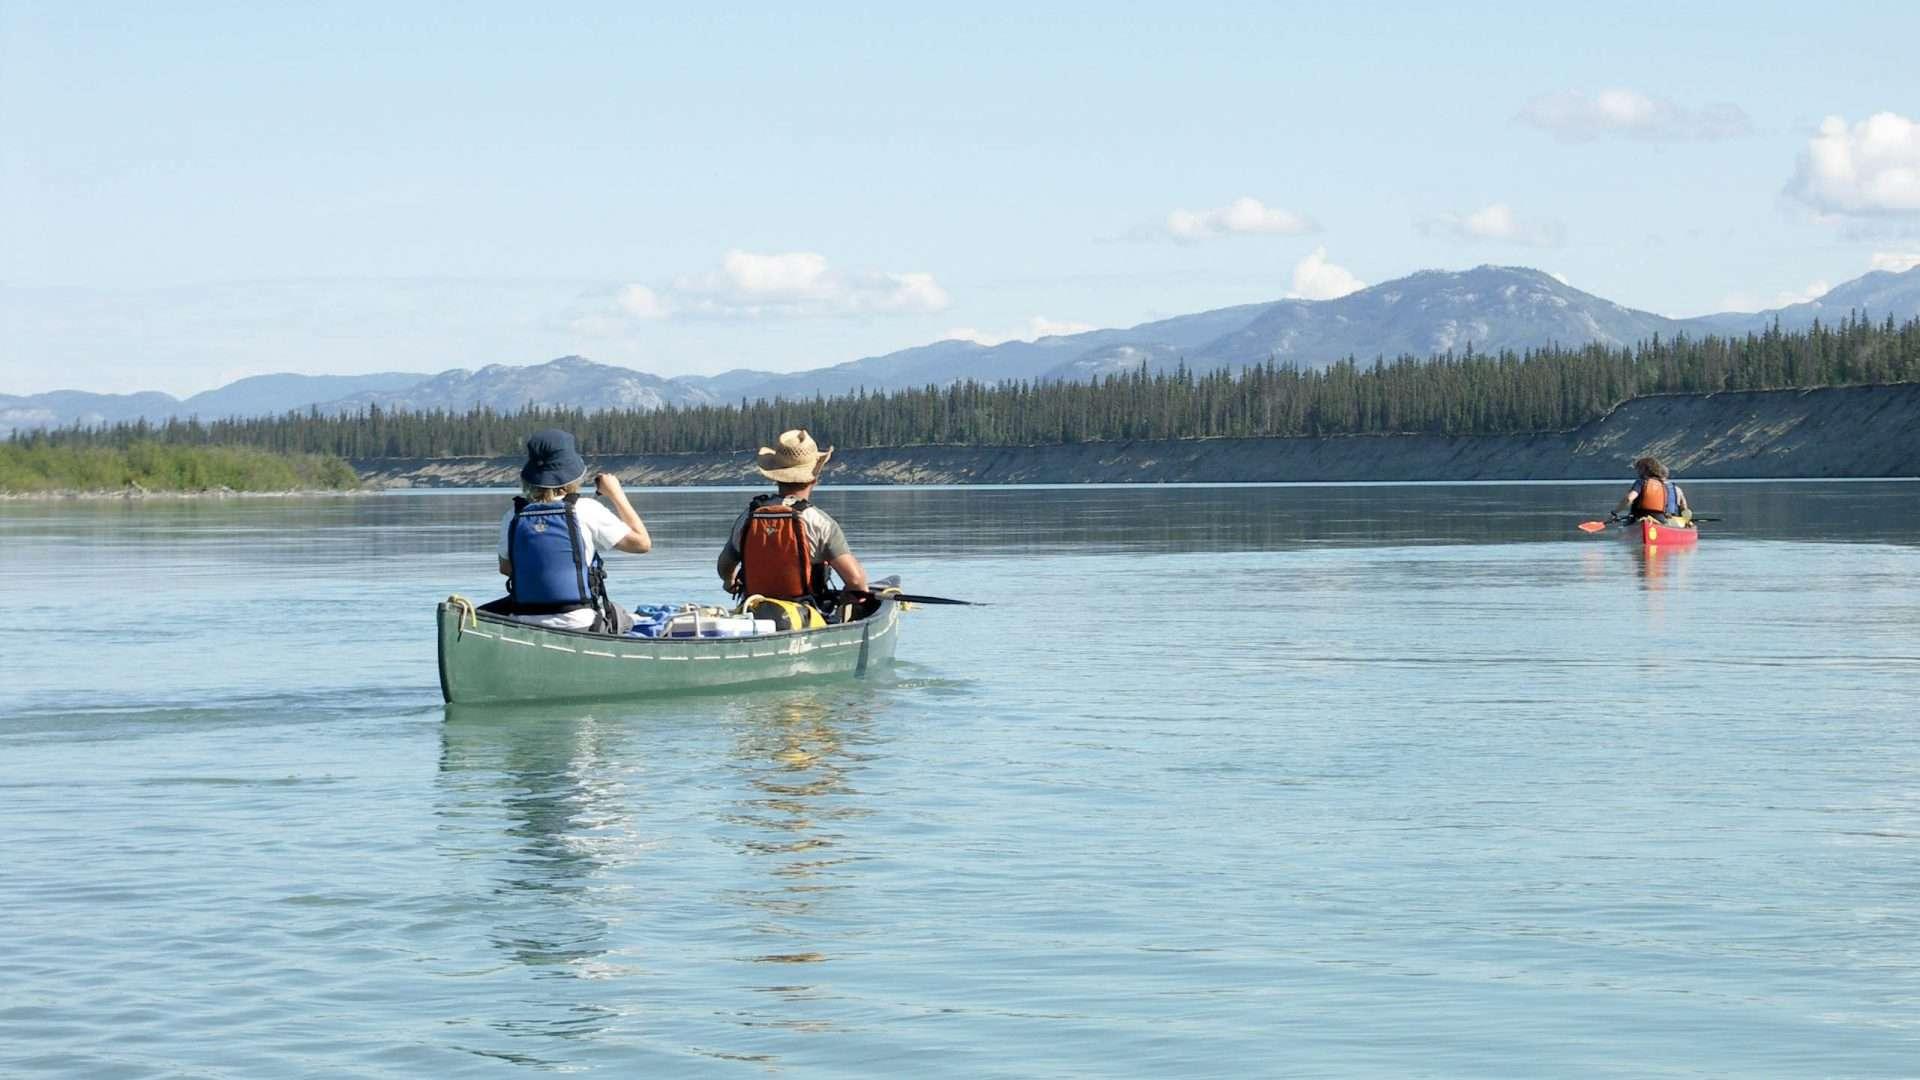 Yukon River Tour - Lake Laberge bis Carmacks - Auf dem Yukon River